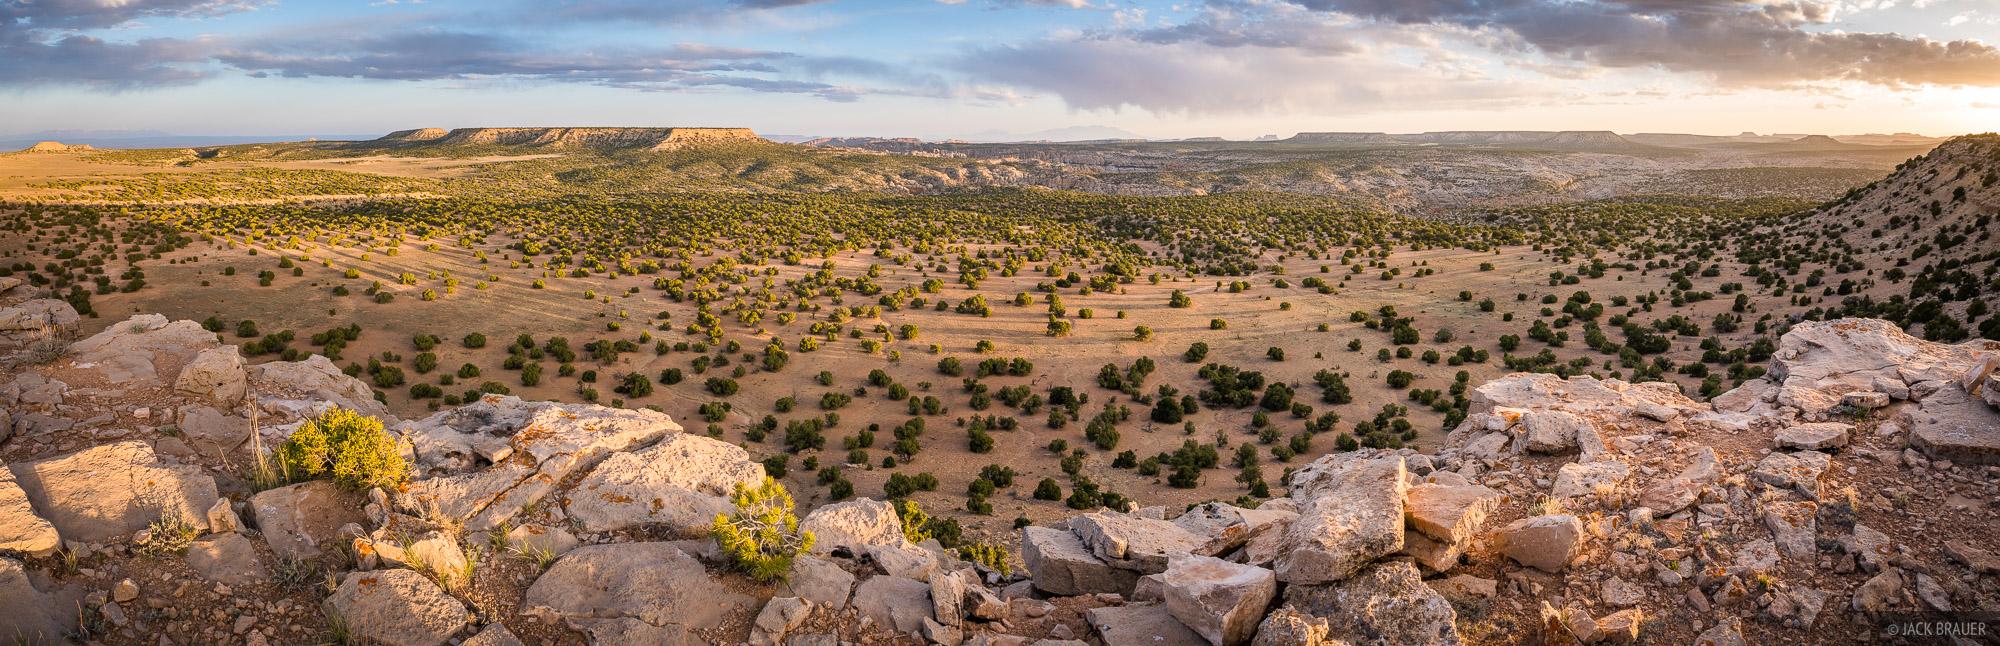 Eardley Canyon, San Rafael Swell, Utah, panorama, photo